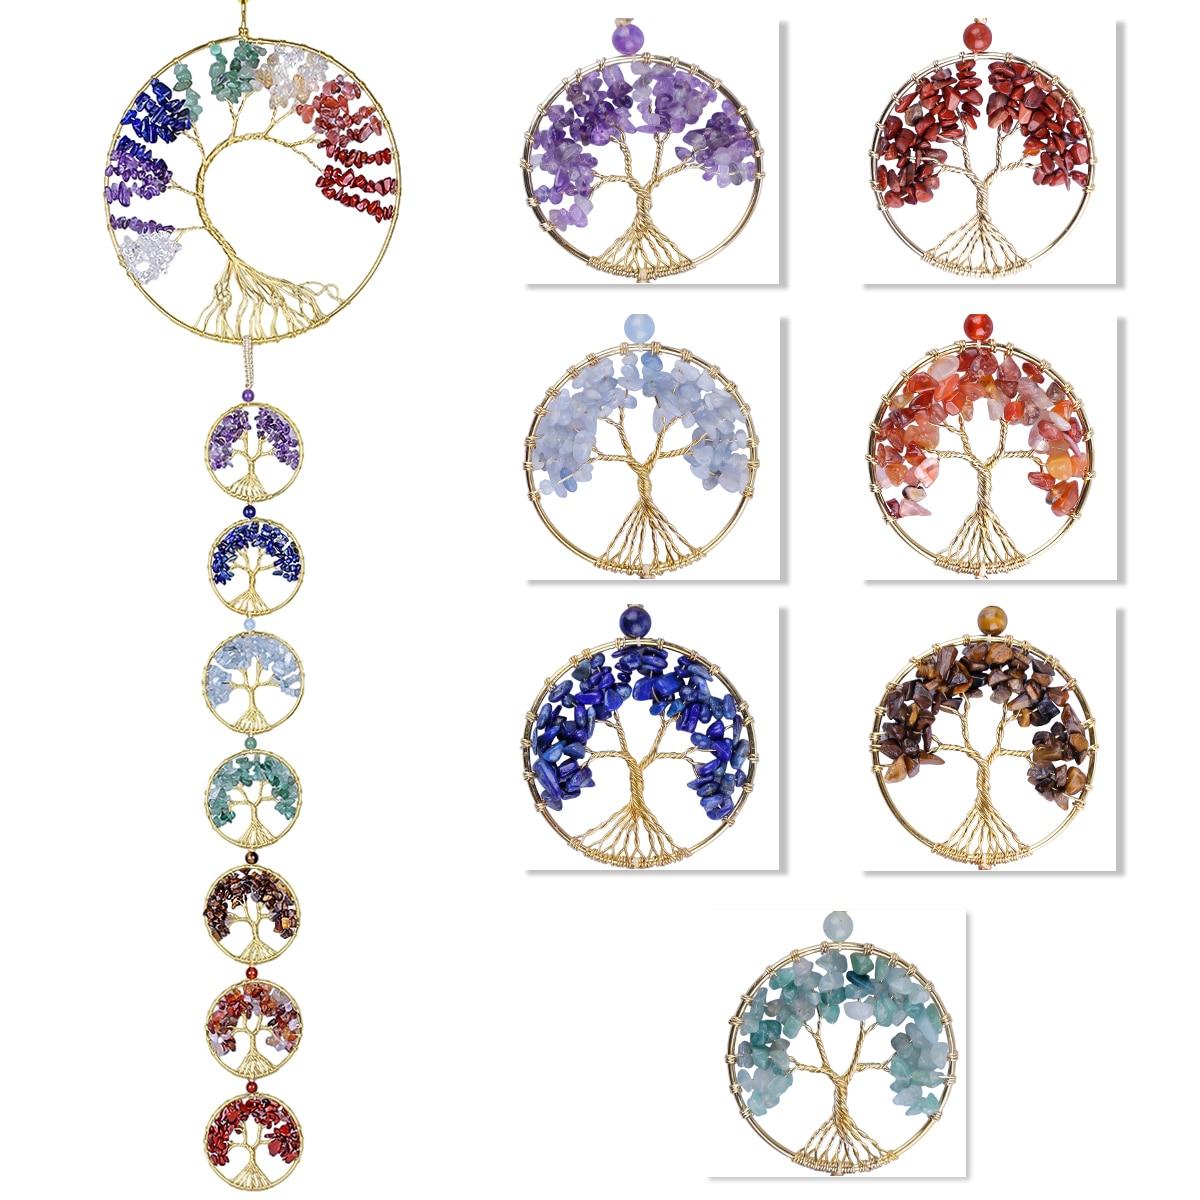 TUMBEELLUWA 7 Chakra Stones Copper Wire Wrapped Tree of Life Handmade Hanging Ornament Healing Crystal Wall Window Home Decor недорого